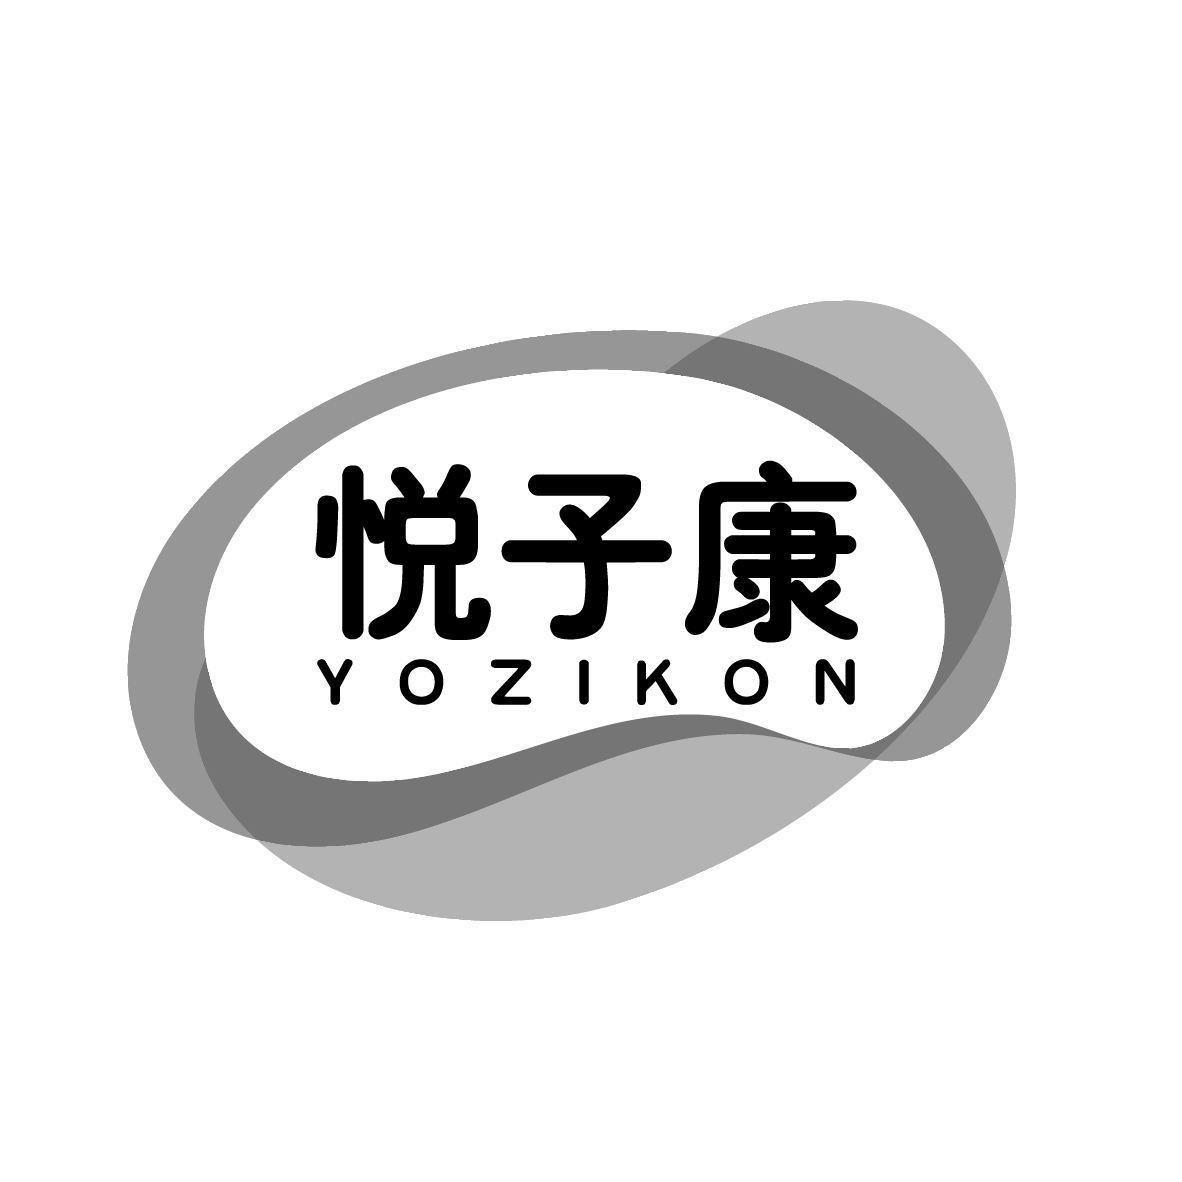 悦子康 YOZIKON